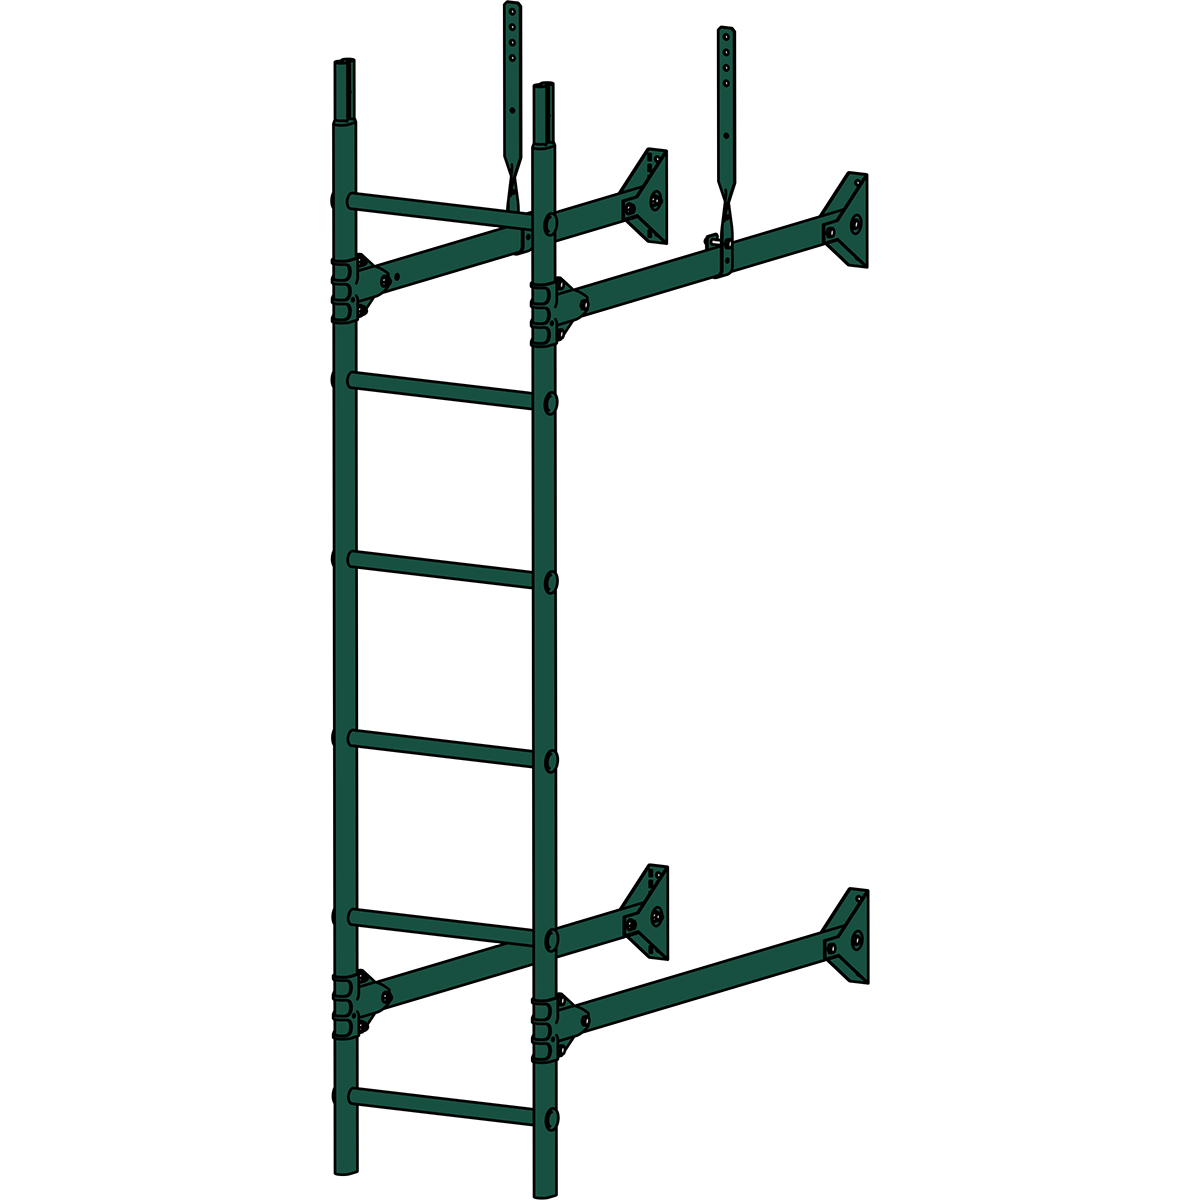 Лестница стеновая ROOFSYSTEMS PRESTIGE ZN 3м RAL 6005 Зеленый мох